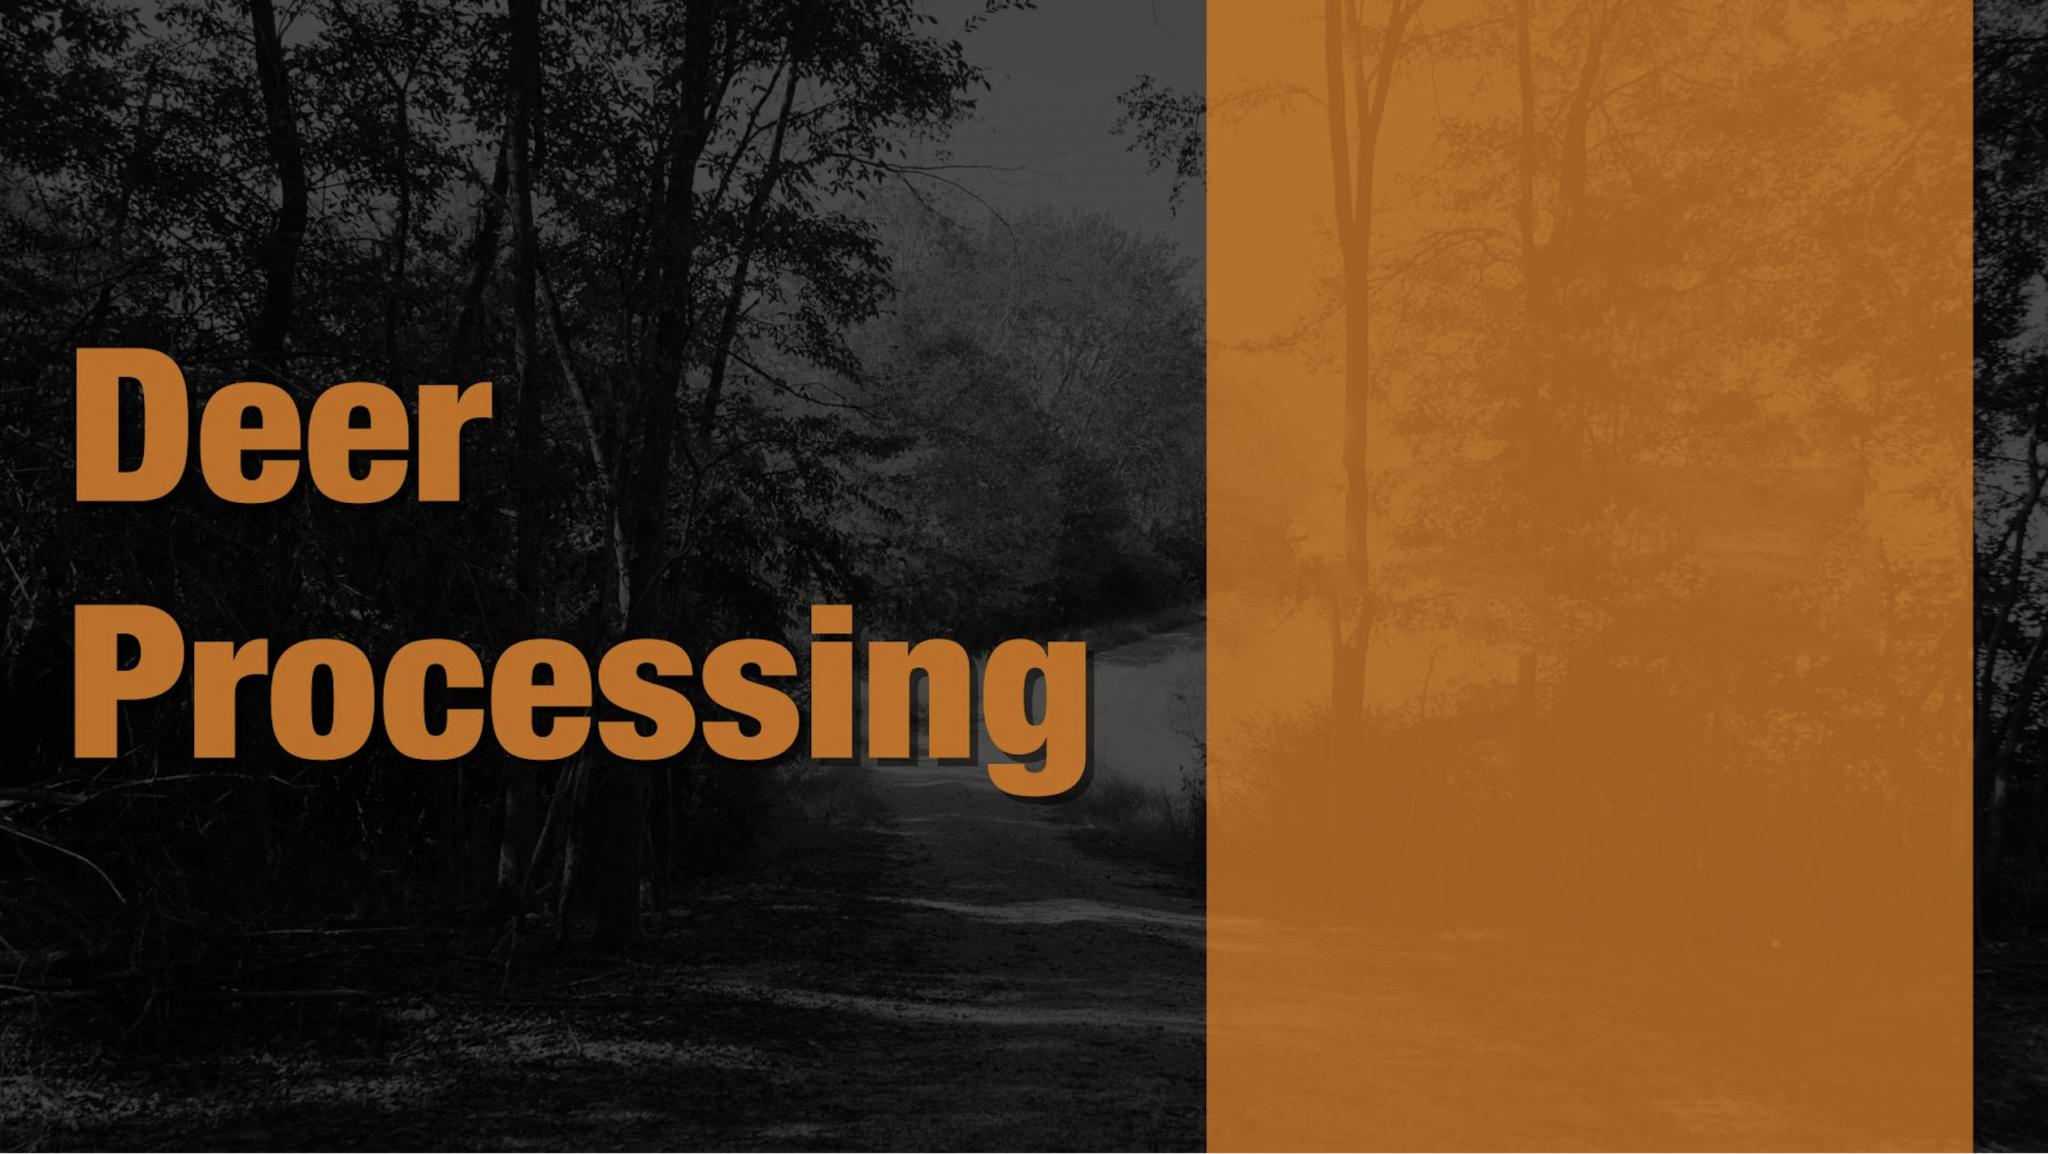 Deer Processing Title Card